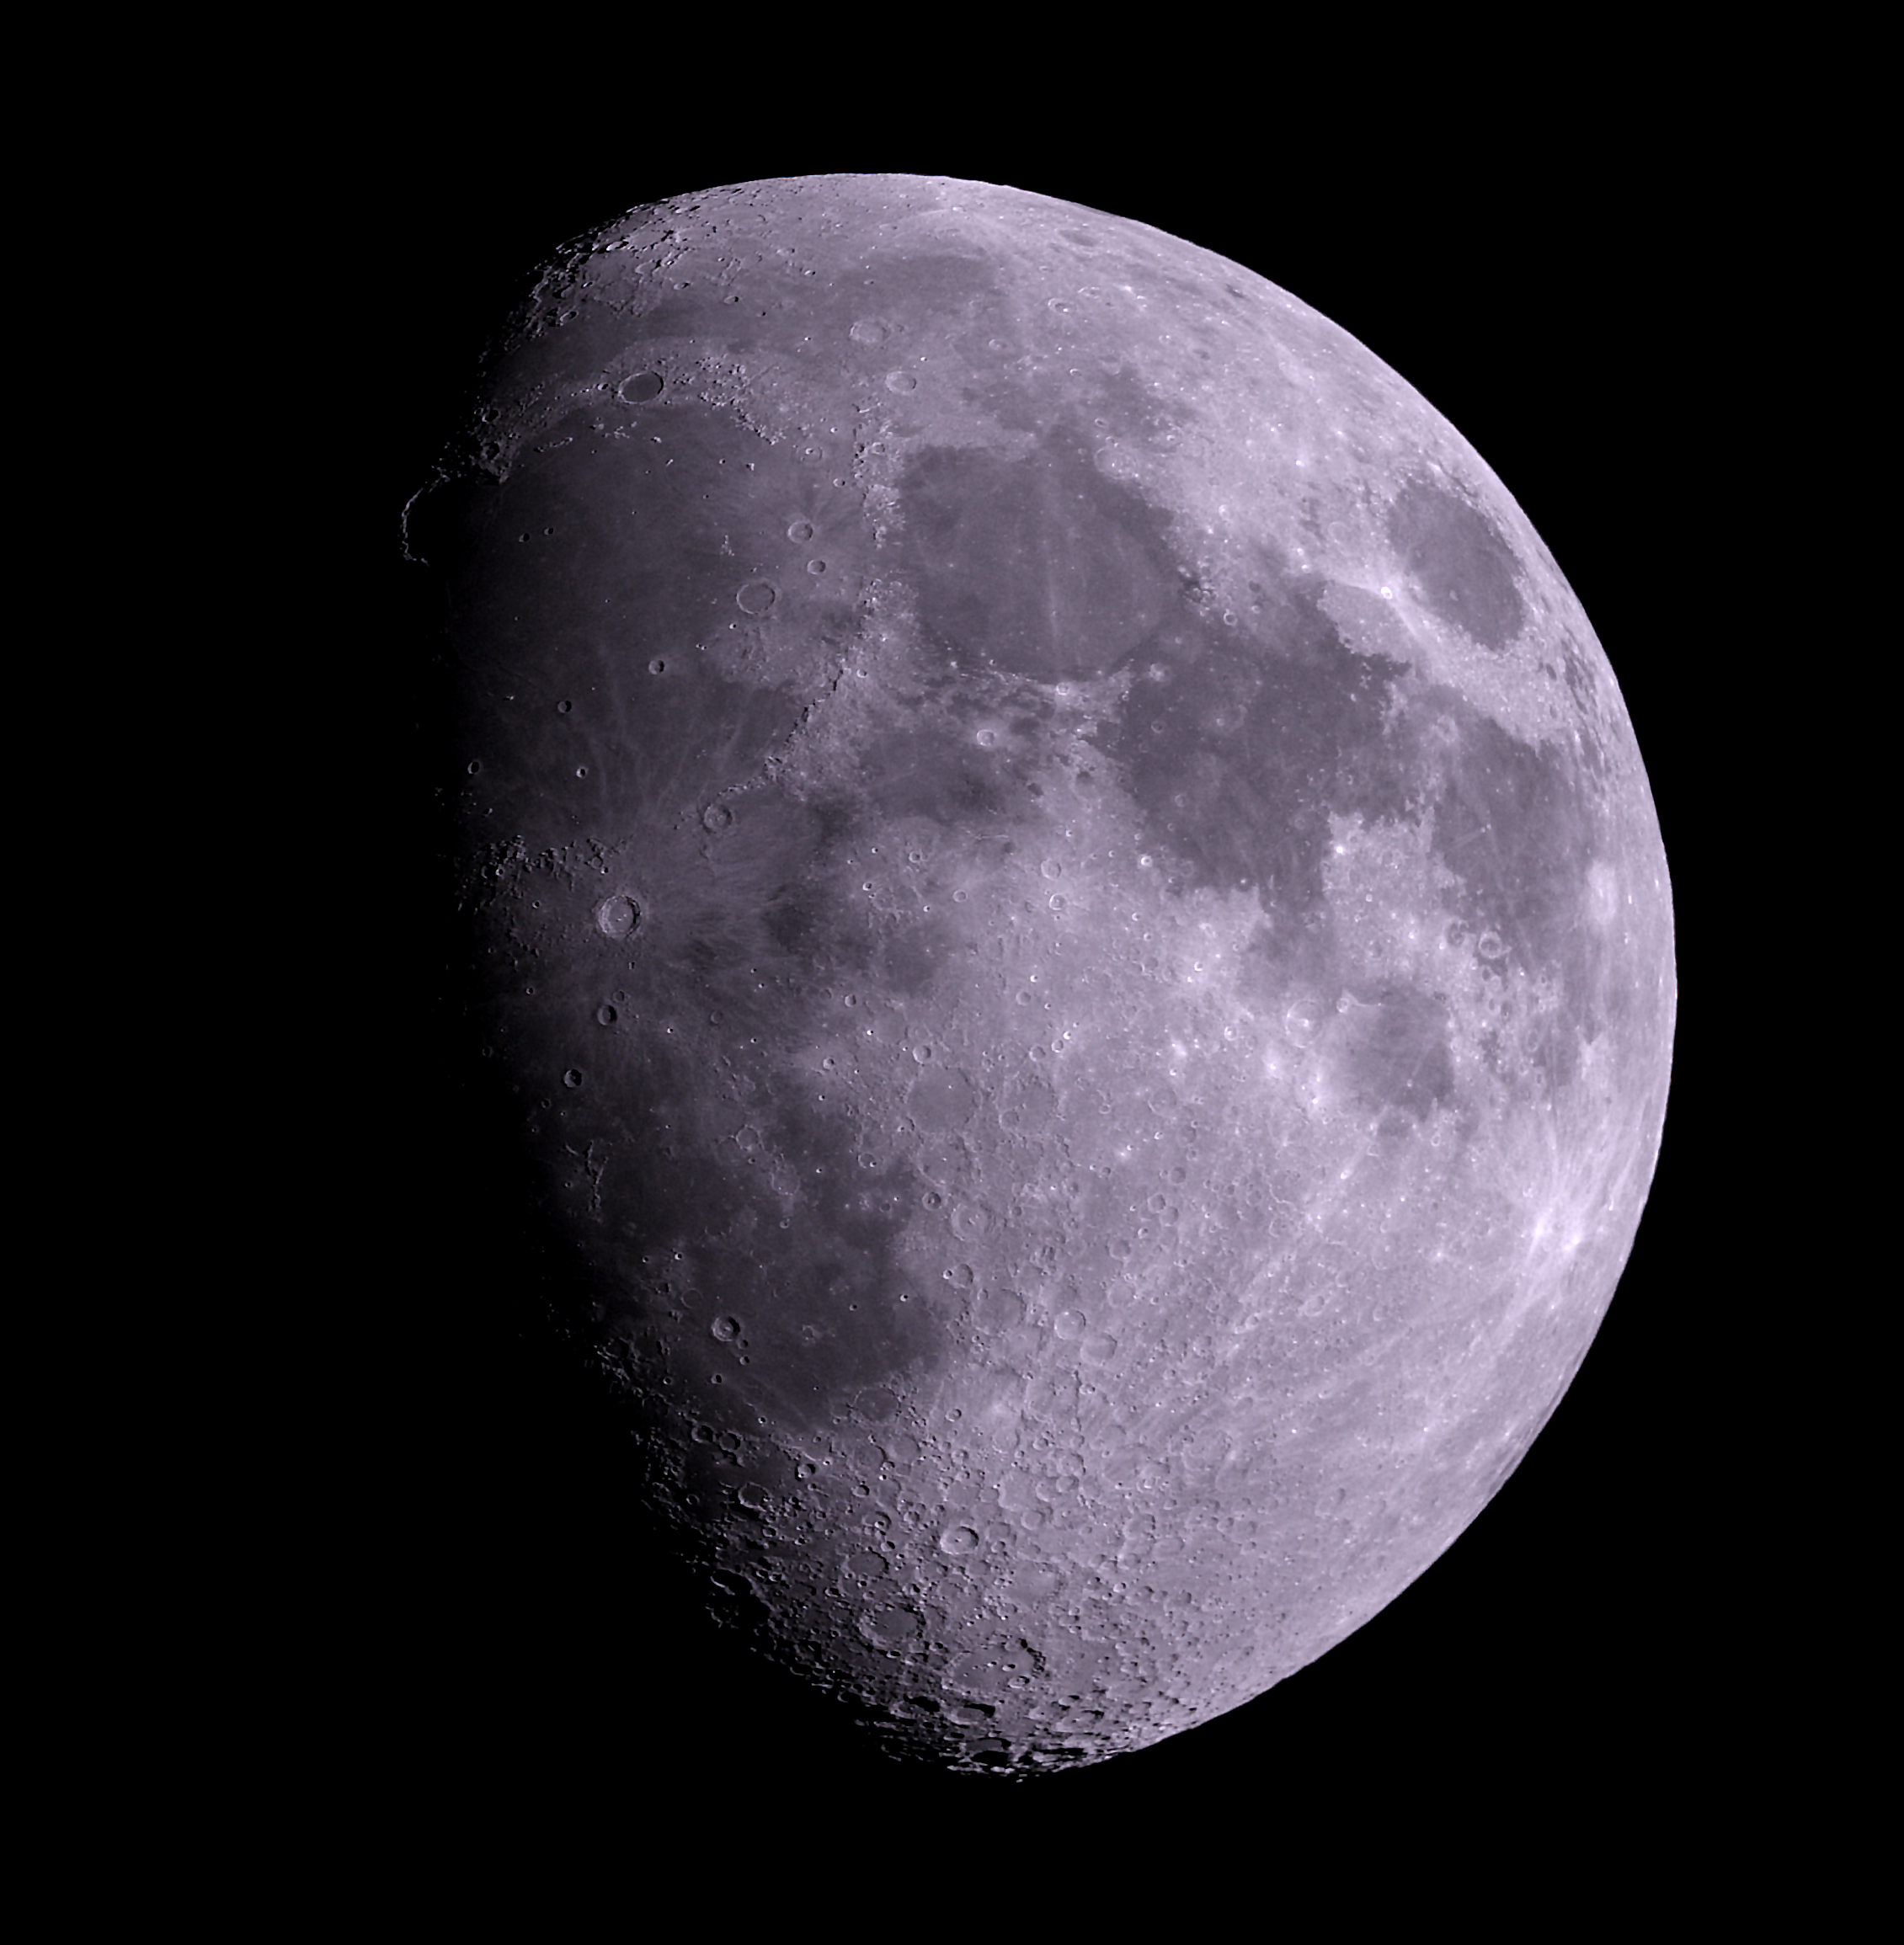 lune_samedi_16_mars_2019_2_iris_cc__derawtisé_rgb107_100_110_cc_png_2.png